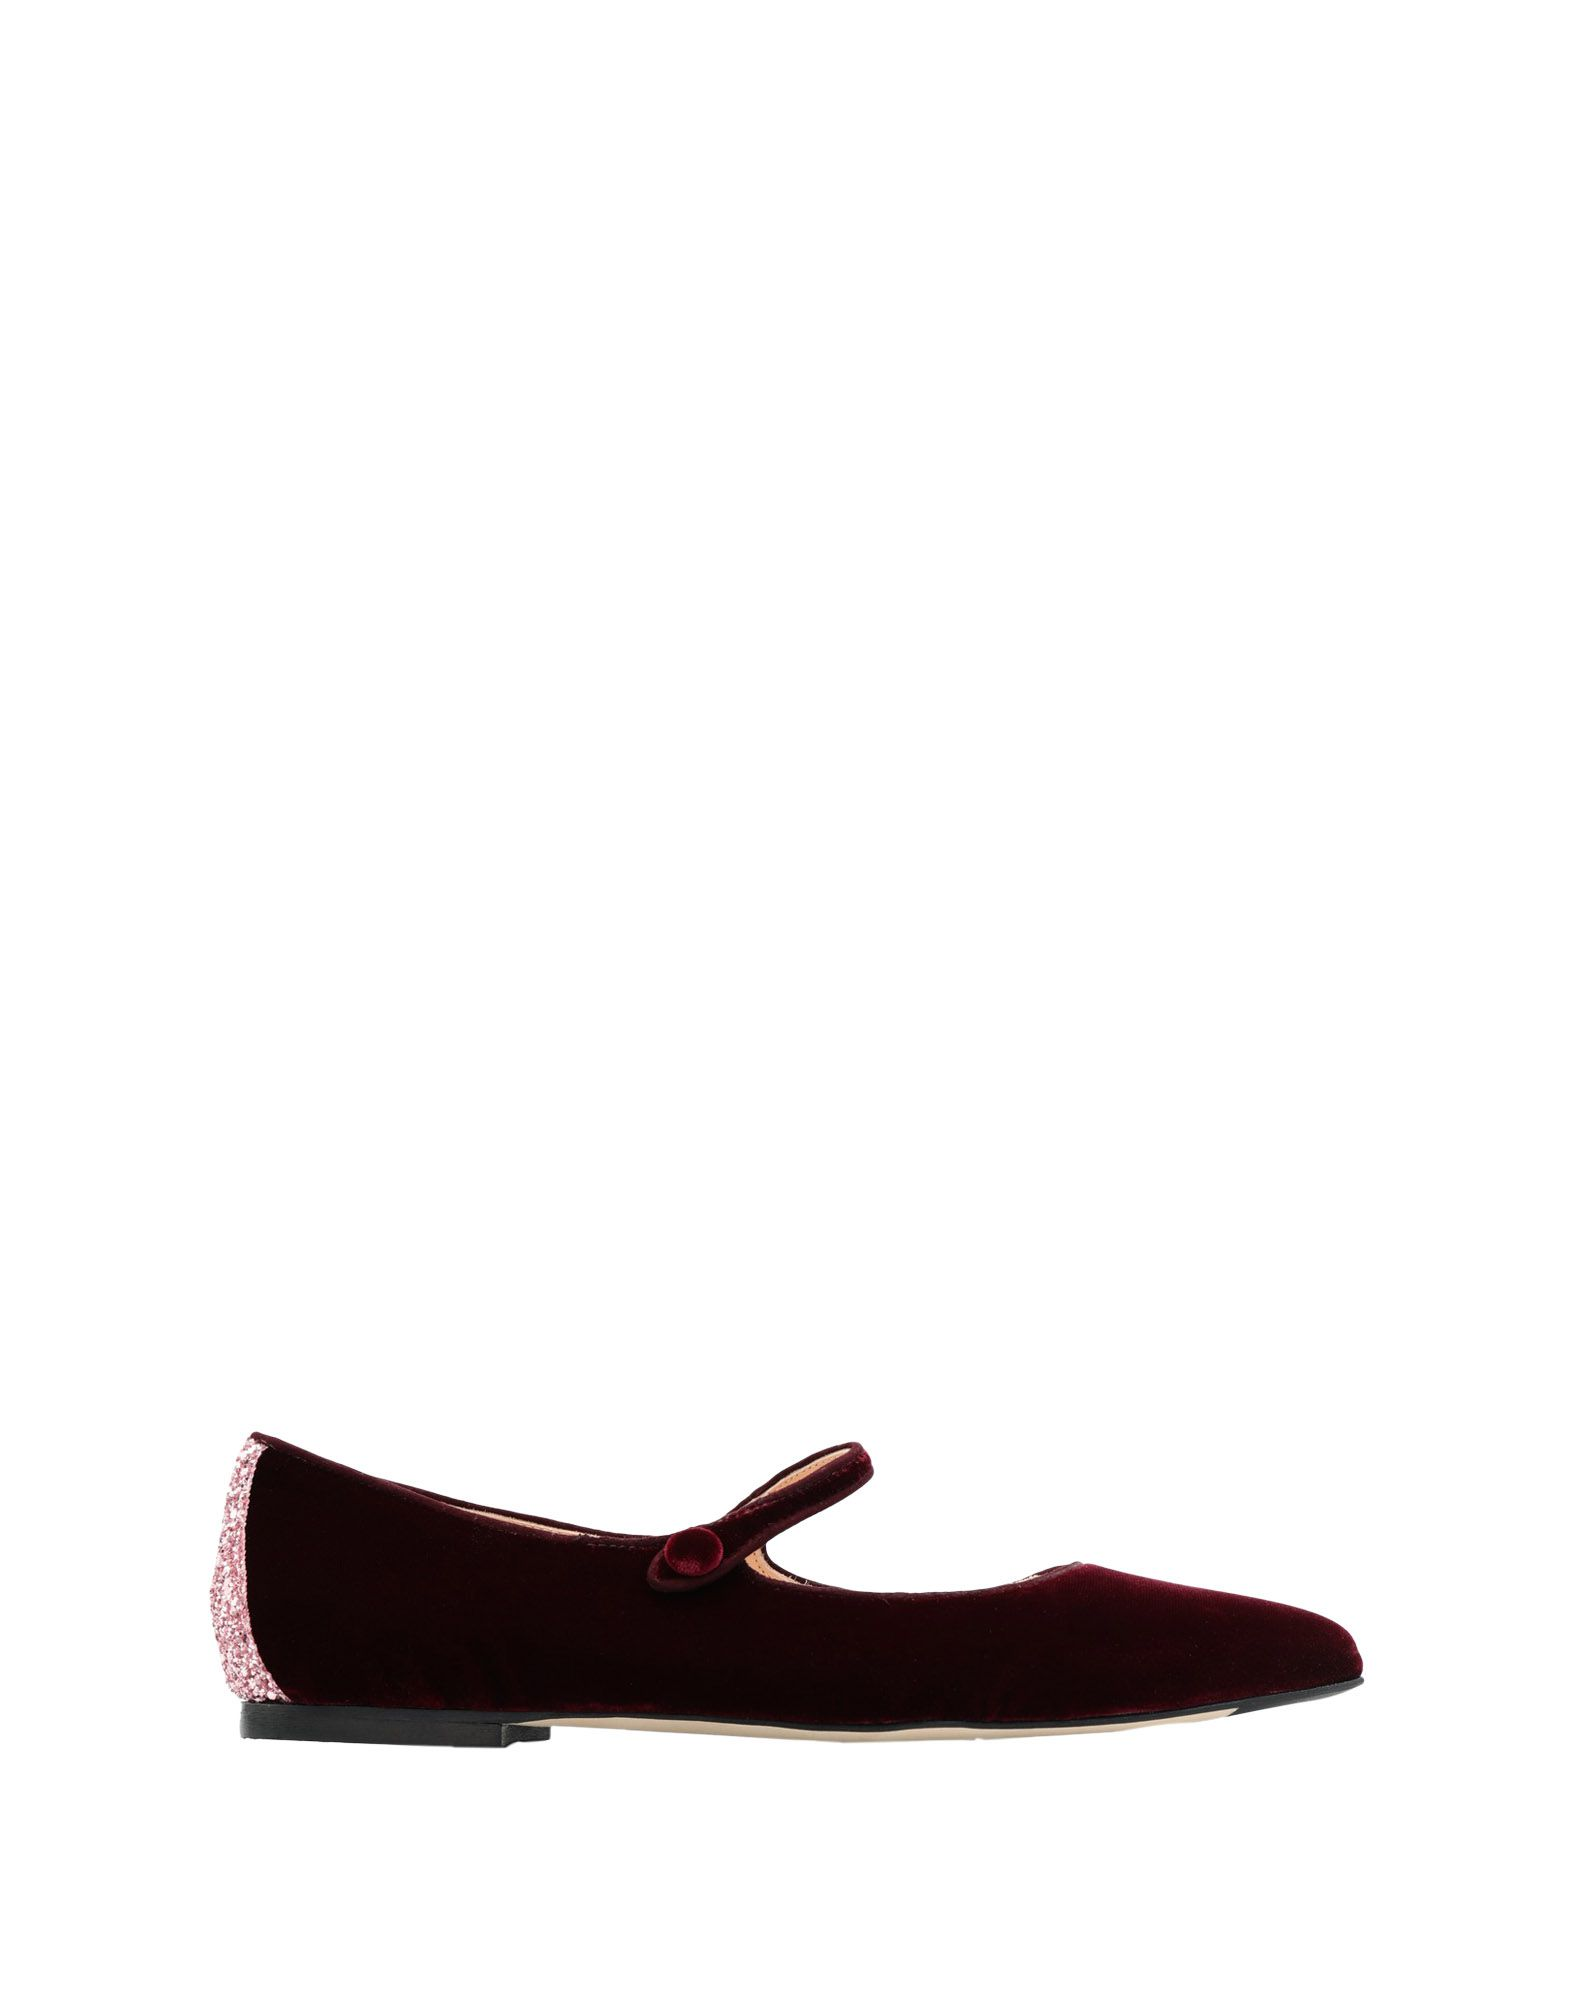 Mia Moltrasio Mia Ballet Flats - Women Mia Moltrasio Moltrasio Ballet Flats online on  United Kingdom - 11519258UA b73134